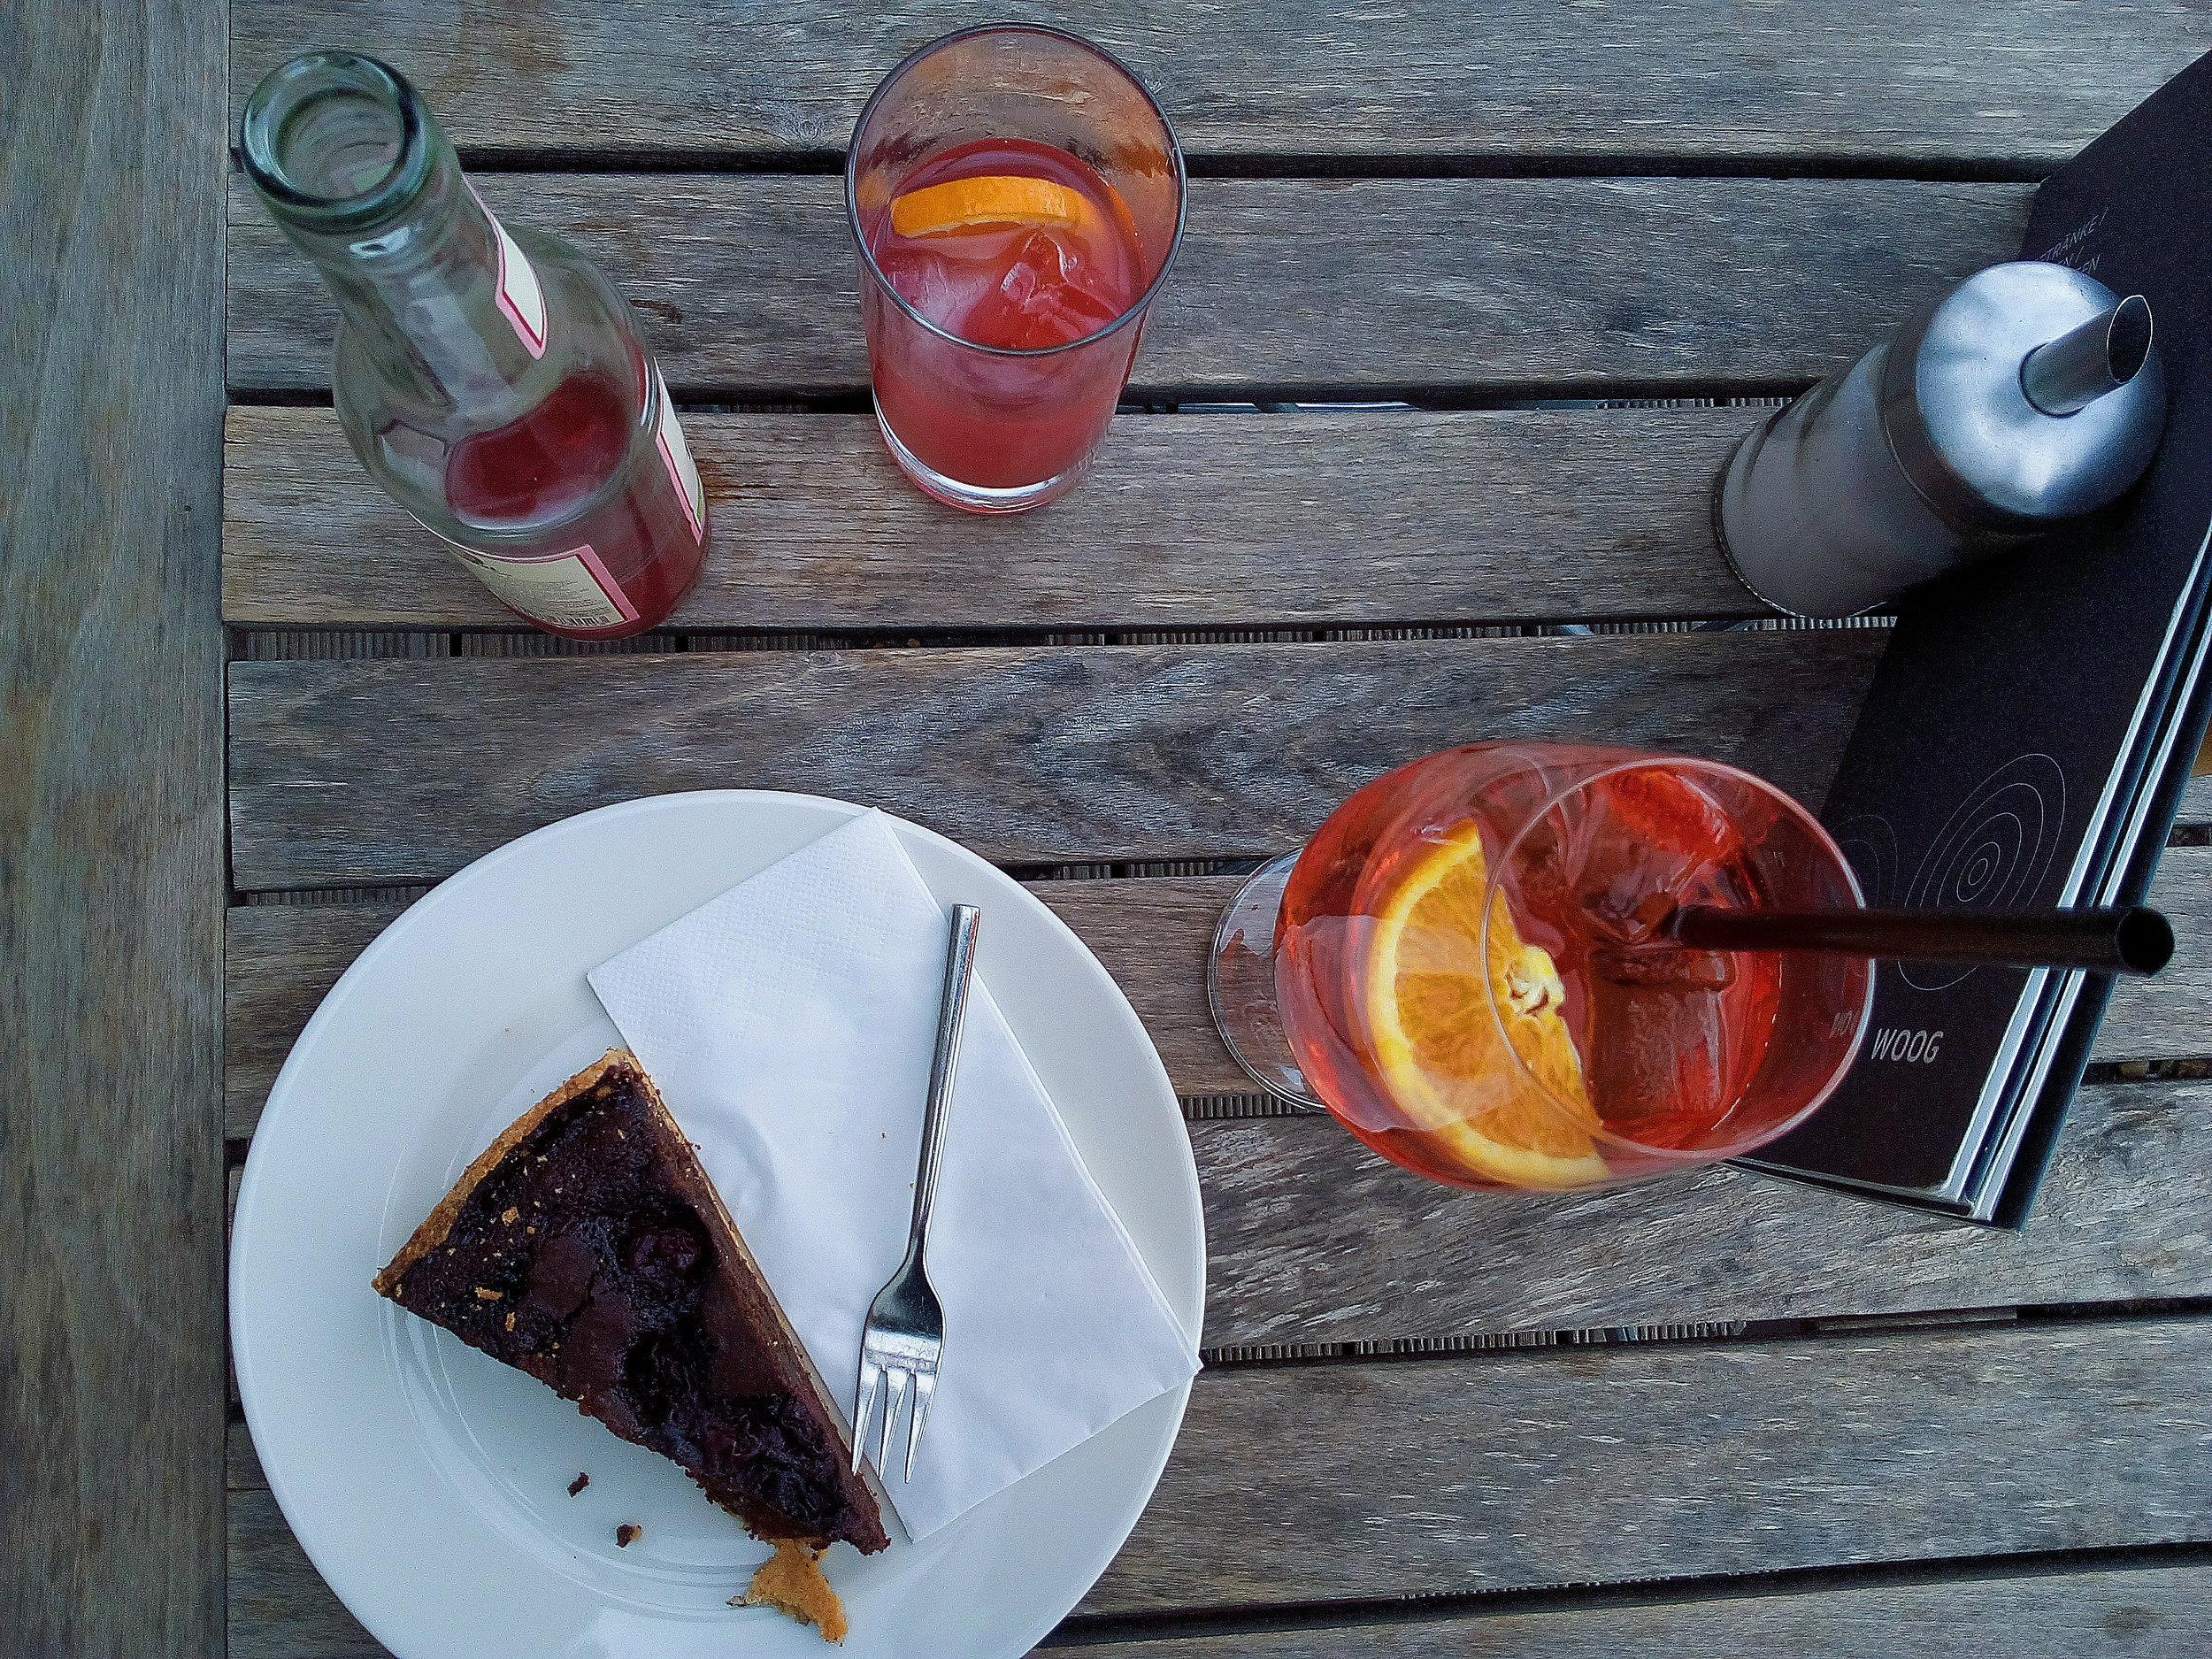 Woog Café serves delicious homemade cake and drinks #cake #lethemhavecake #aperolspritz #summerdrink #lemonade #woogcafe